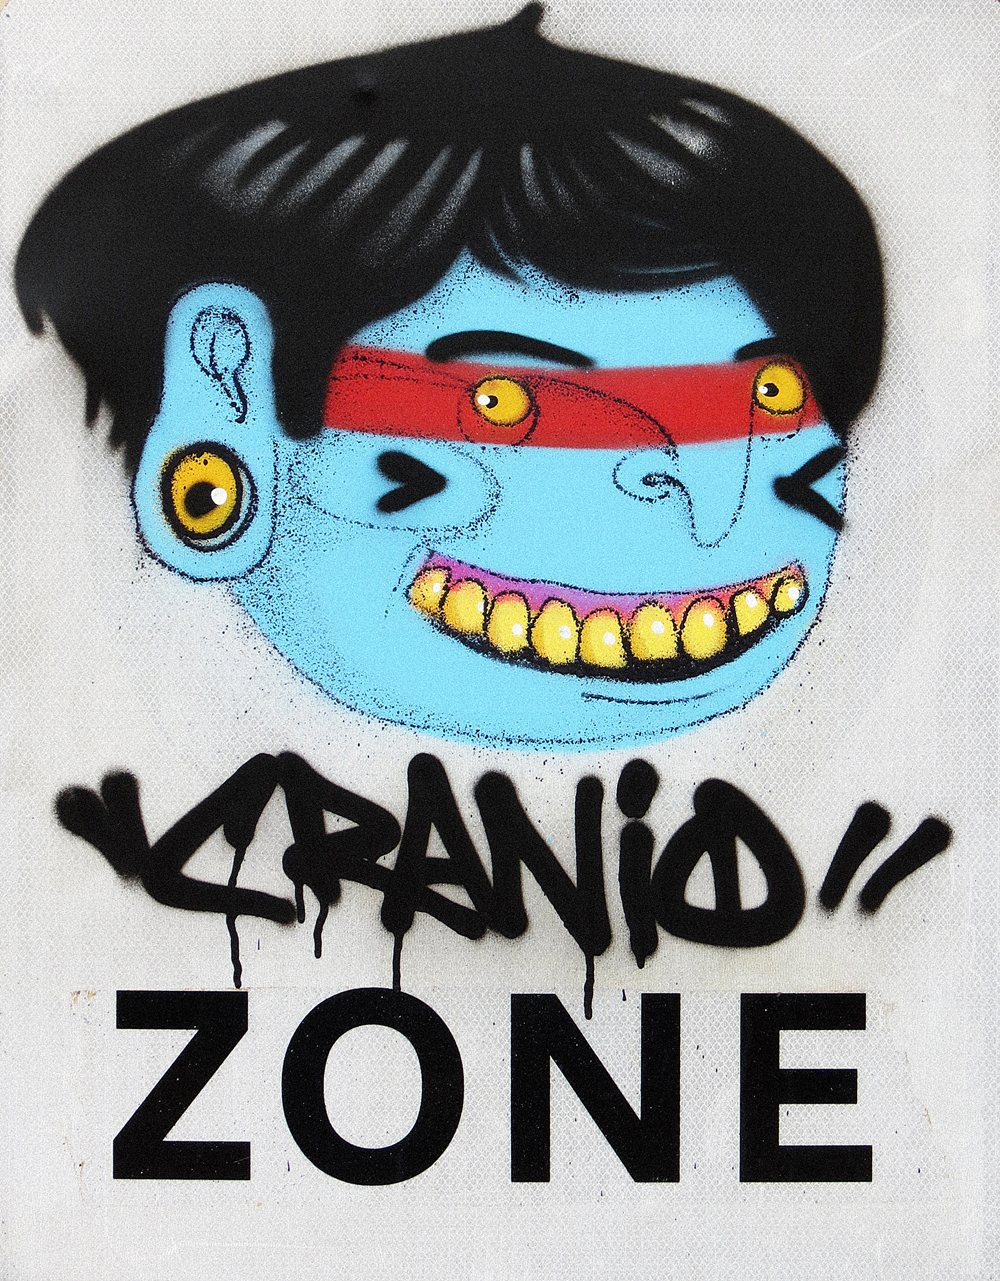 cranio_cranio zone_spray paint on traffic sign _60 x 78.5 cm_£1200.jpg